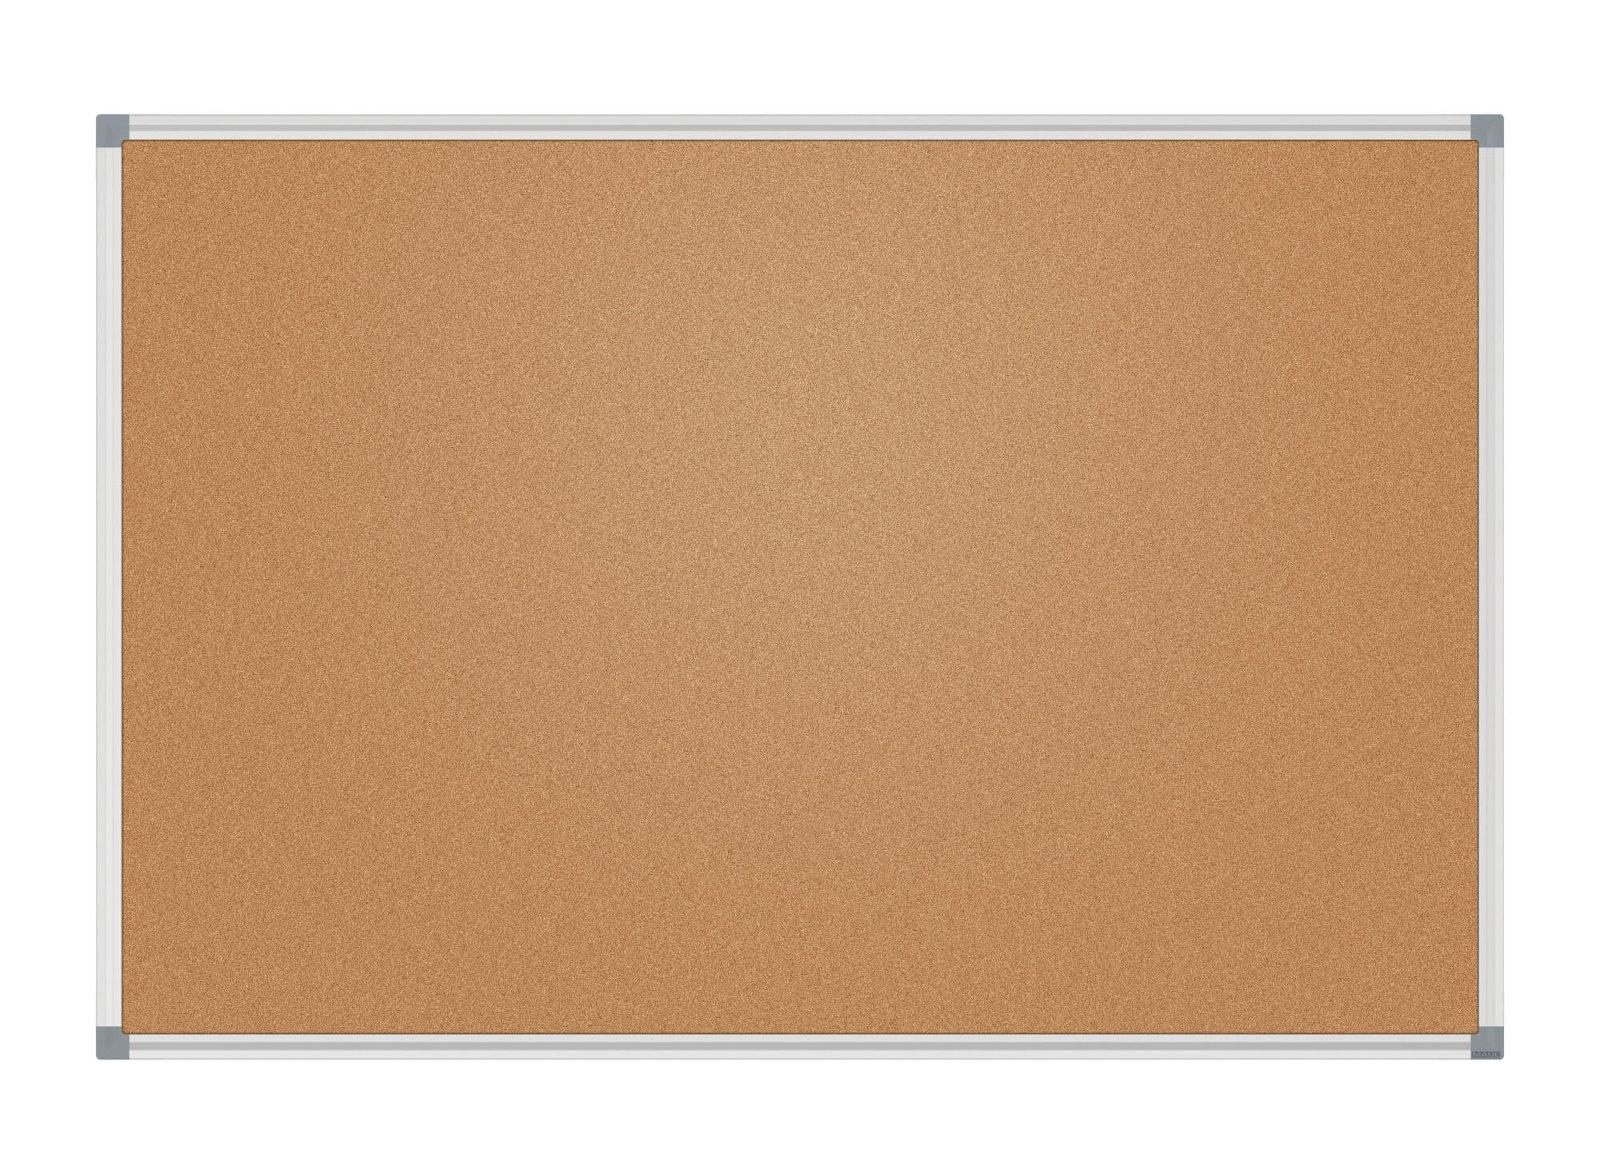 Pinnboard Maulstandard 90x120 cm, Kork, grau